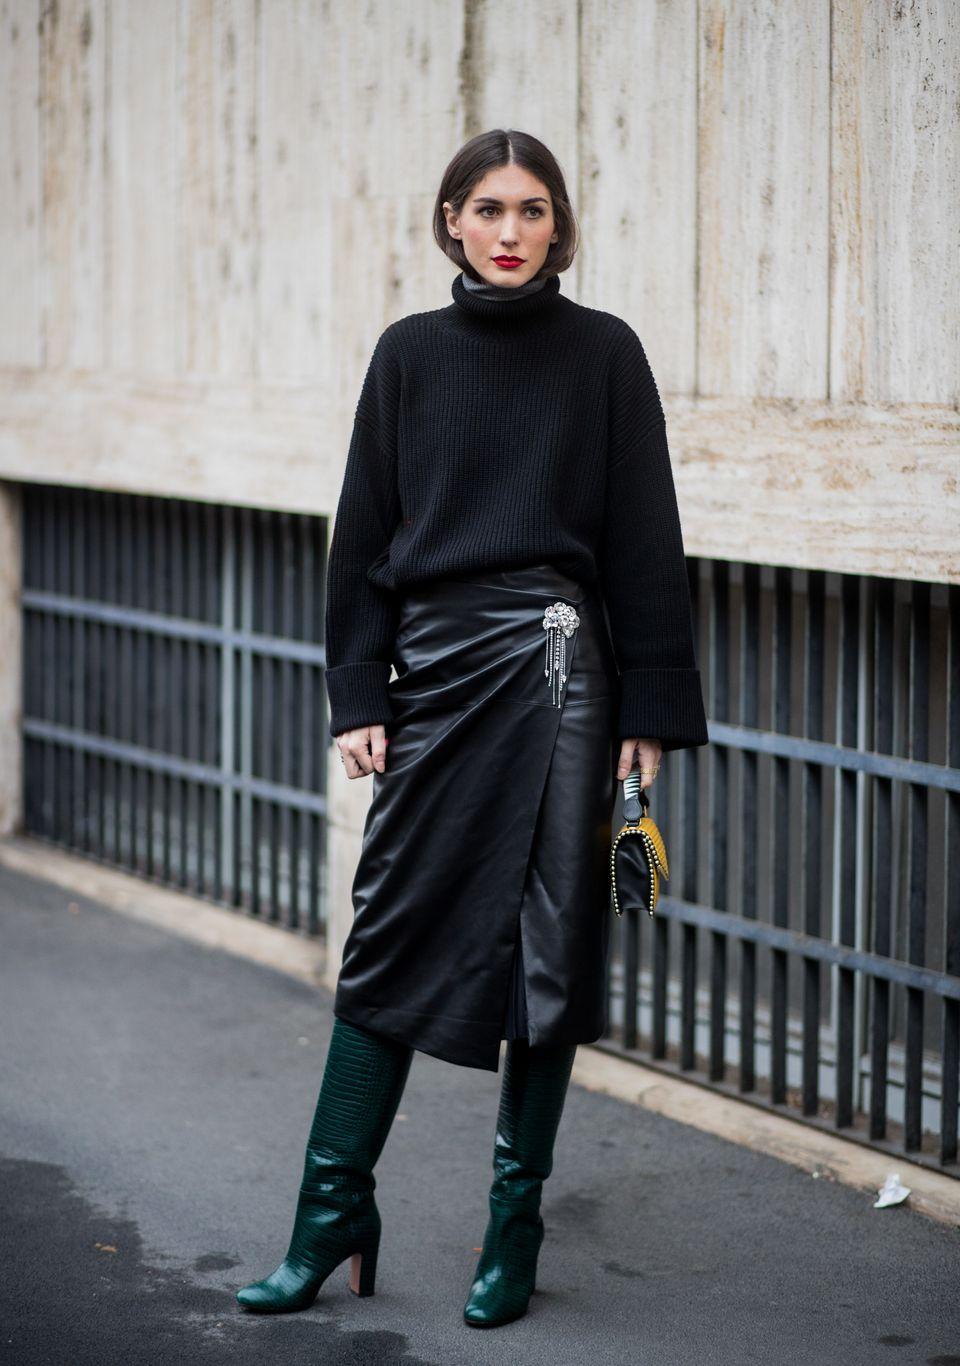 31 Italian Street Style Photos To Inspire Your Wardrobe ...